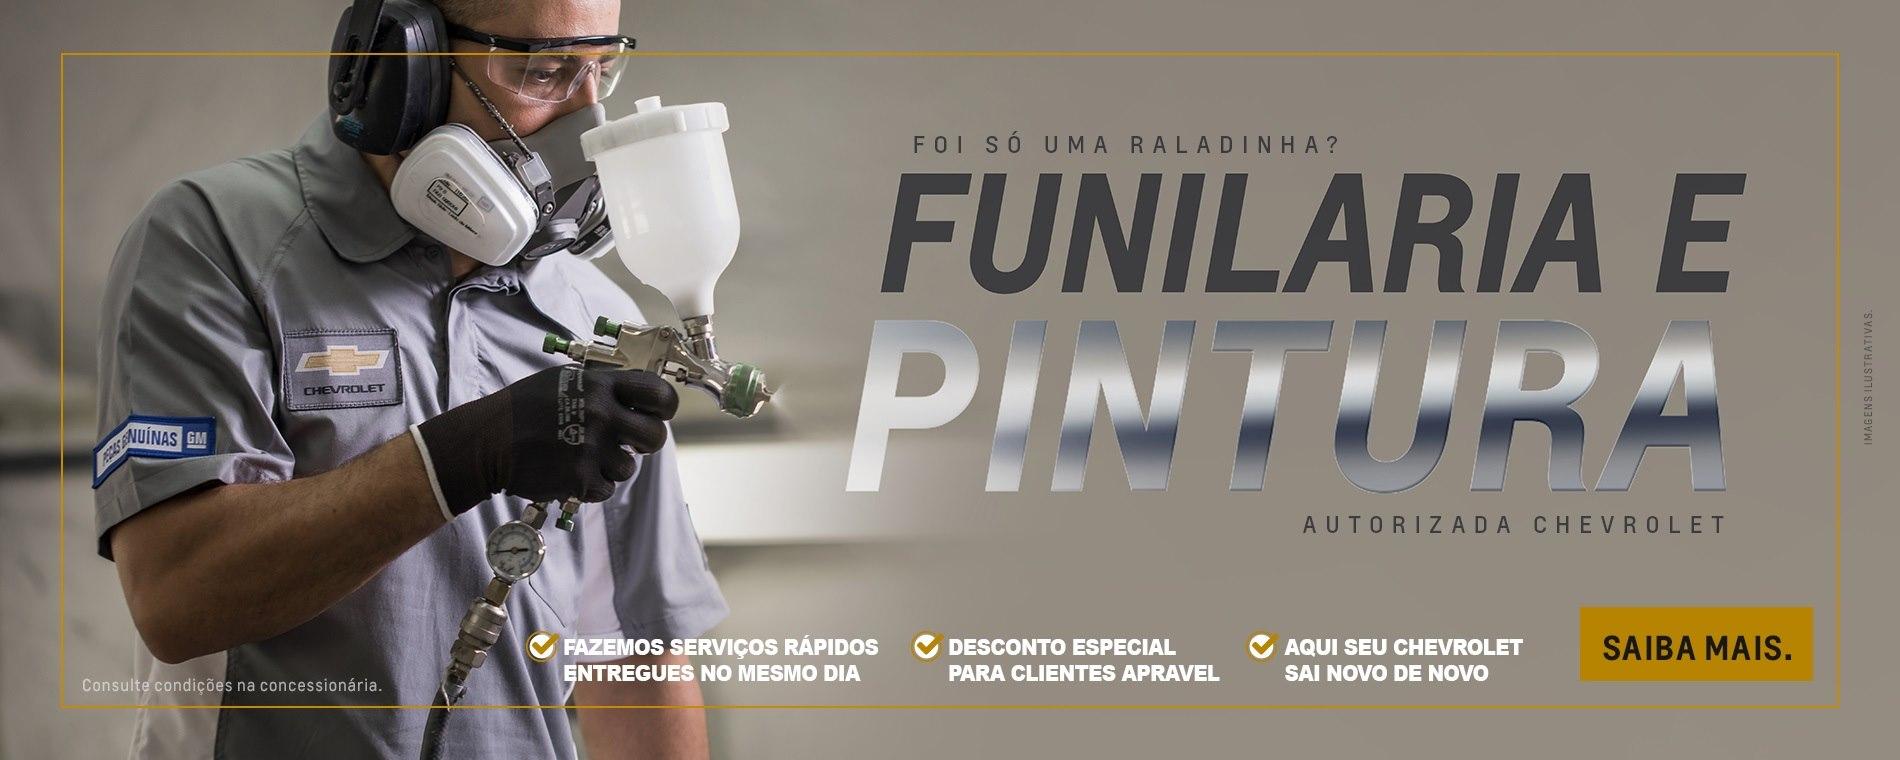 6-Home Oficina Funilaria 1900x760px